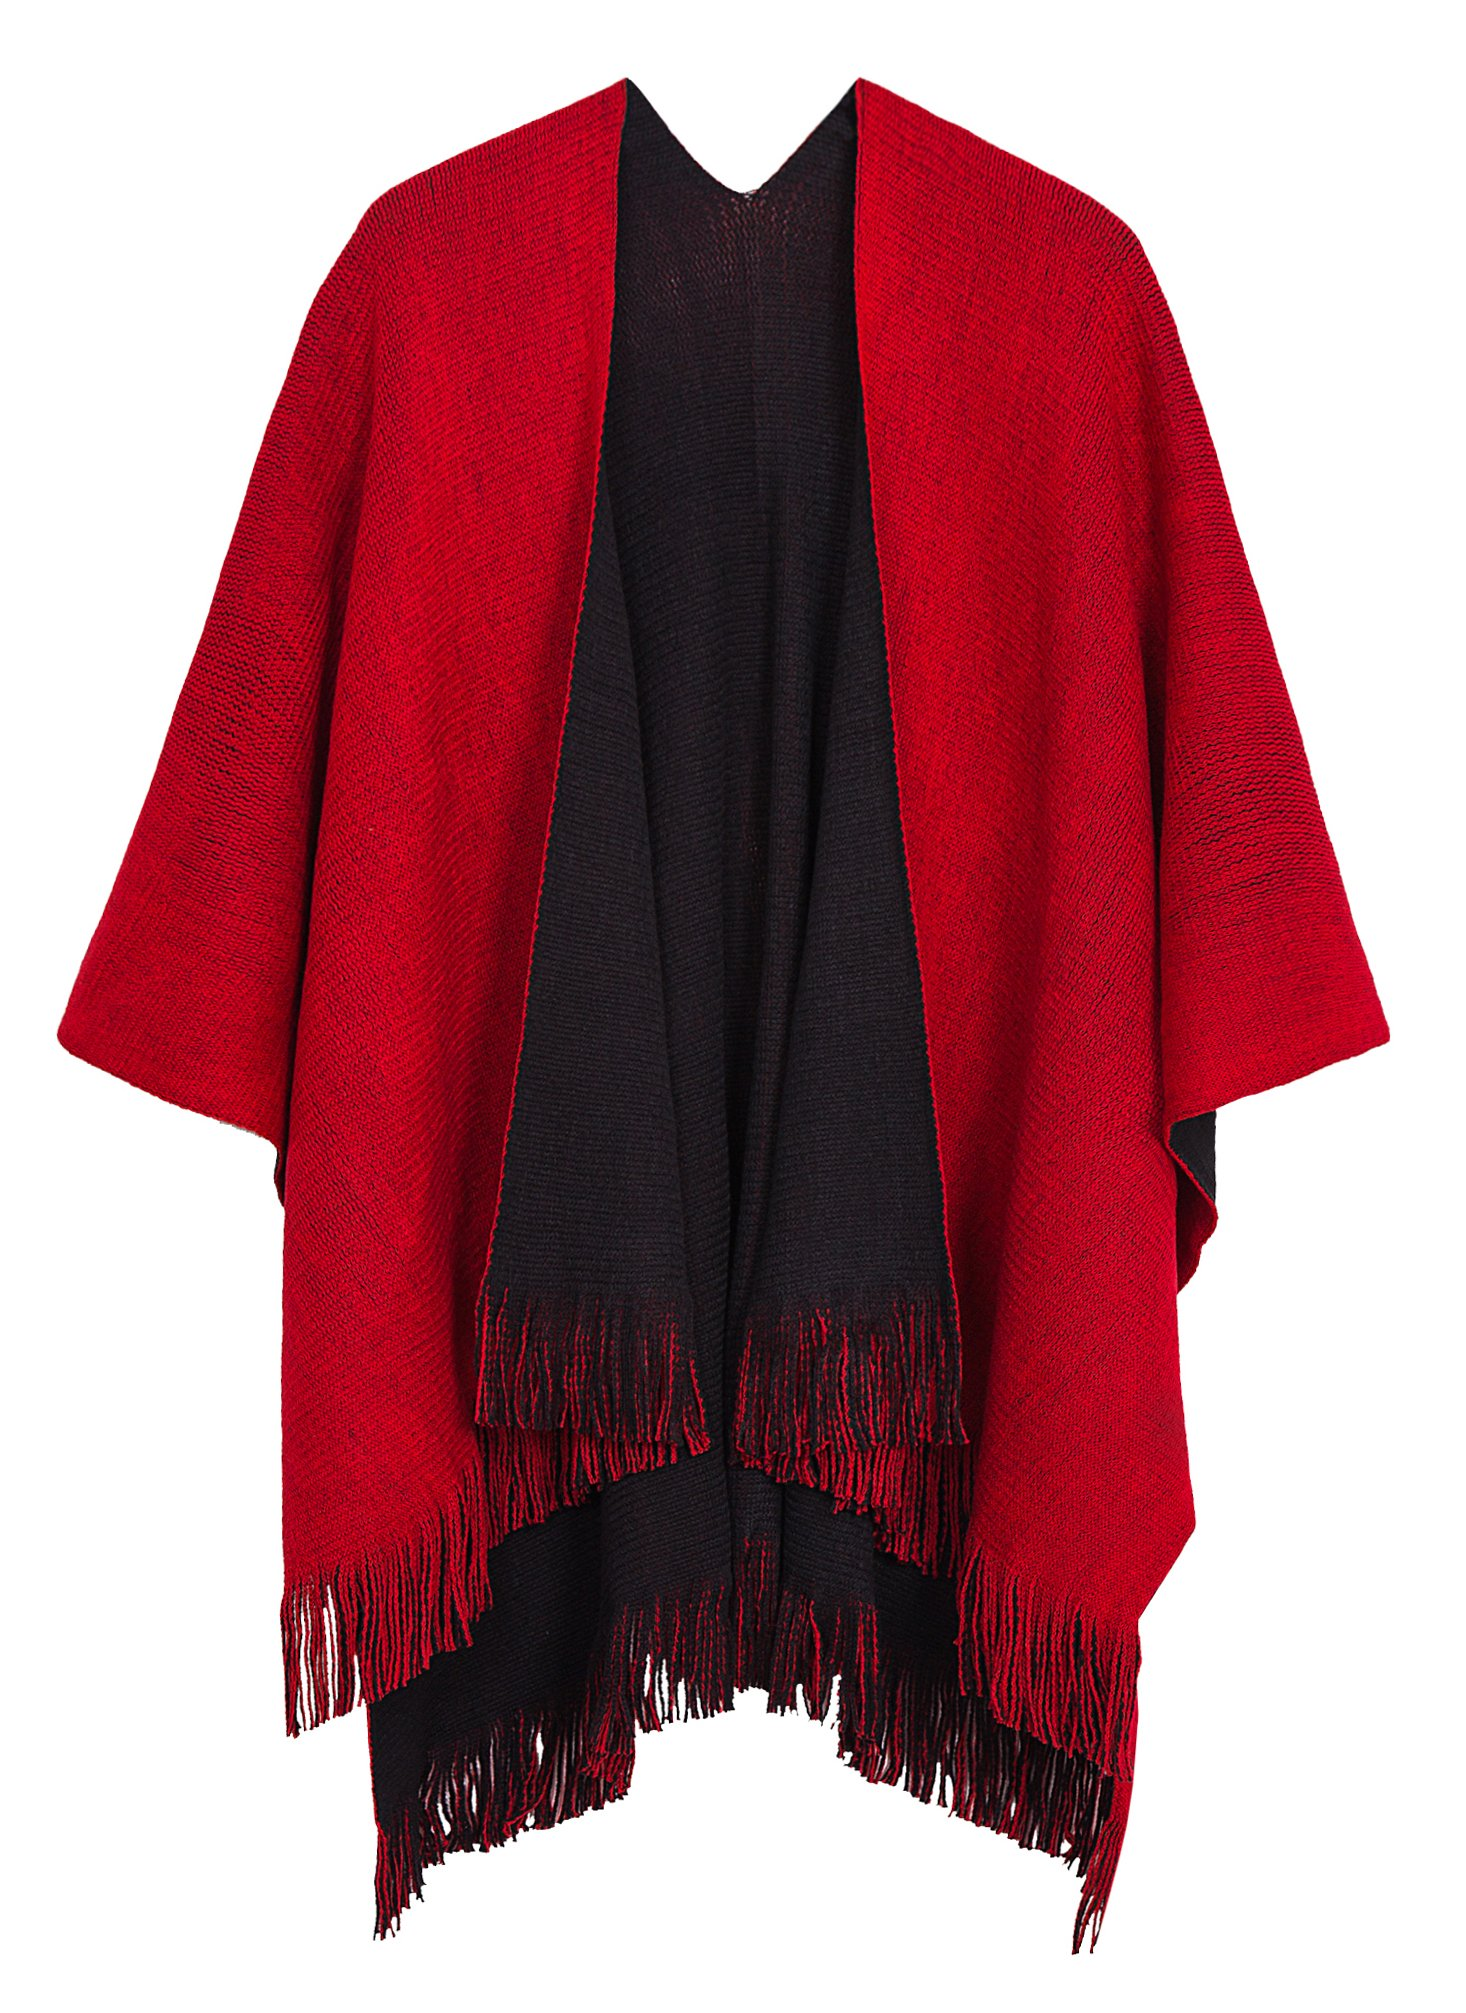 Urban CoCo Women's Vintage Poncho Cape Tassel Shawl Wrap Cardigan Coat (Red)